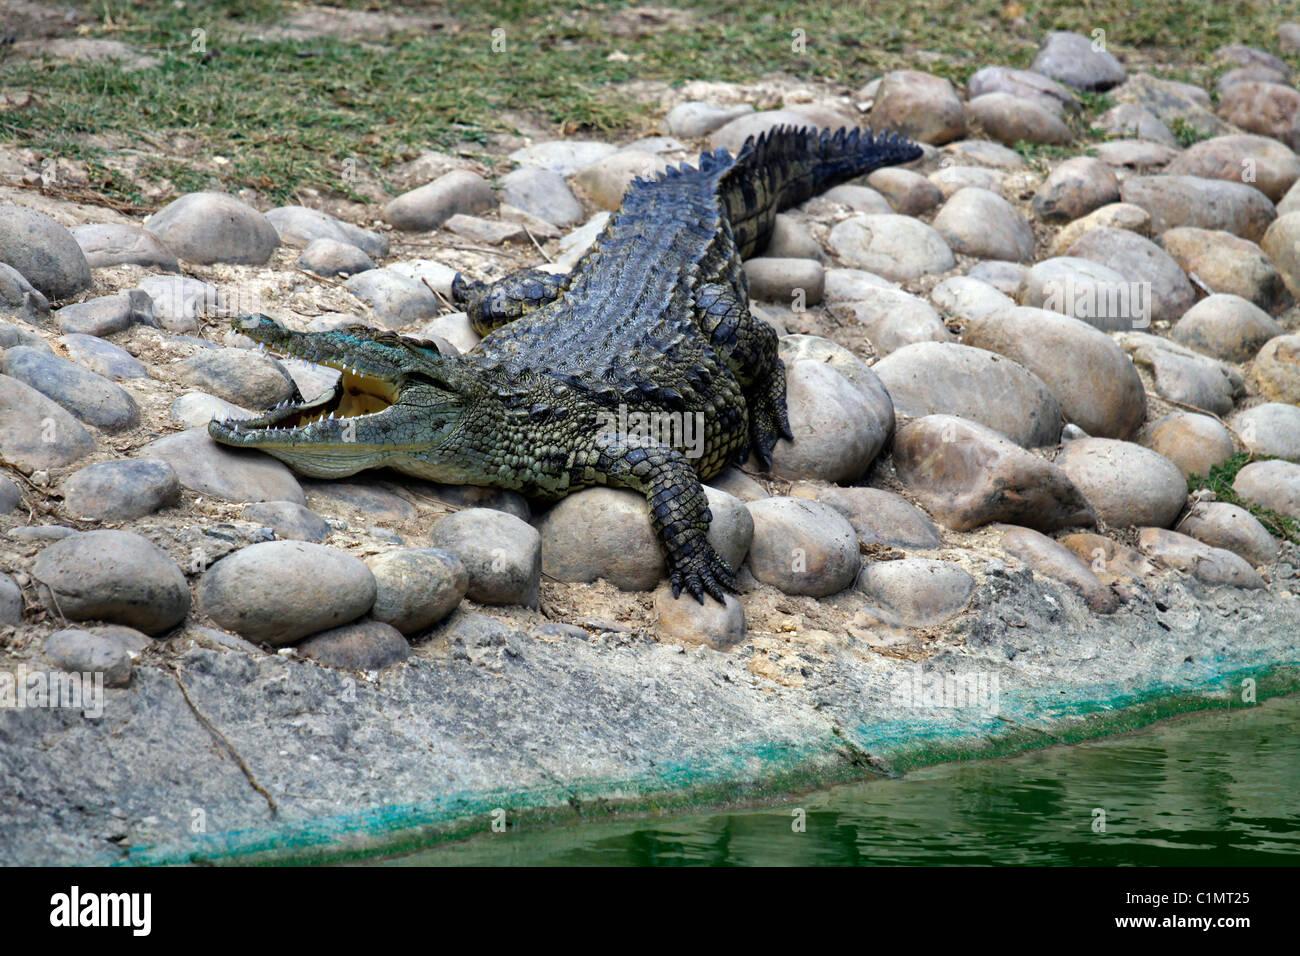 Nile crocodile basking in the sun at Le Bonheur Crocodile Farm near Stellenbosch, South Africa.( Crocodylus niloticus) - Stock Image